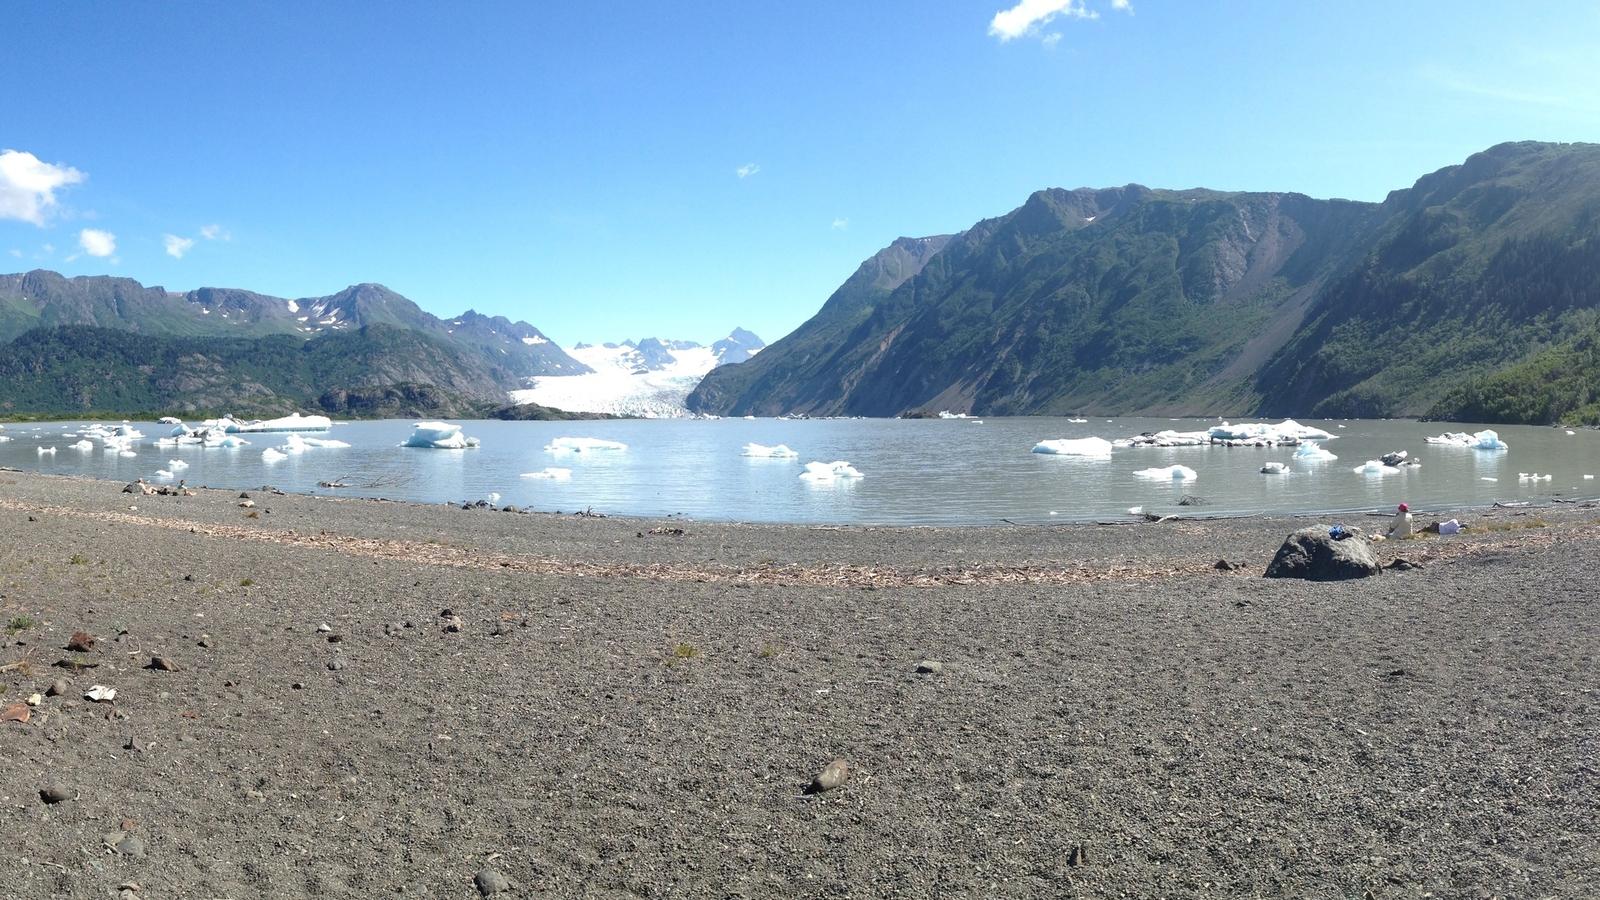 Beach view of Grewingk Glacier Lake